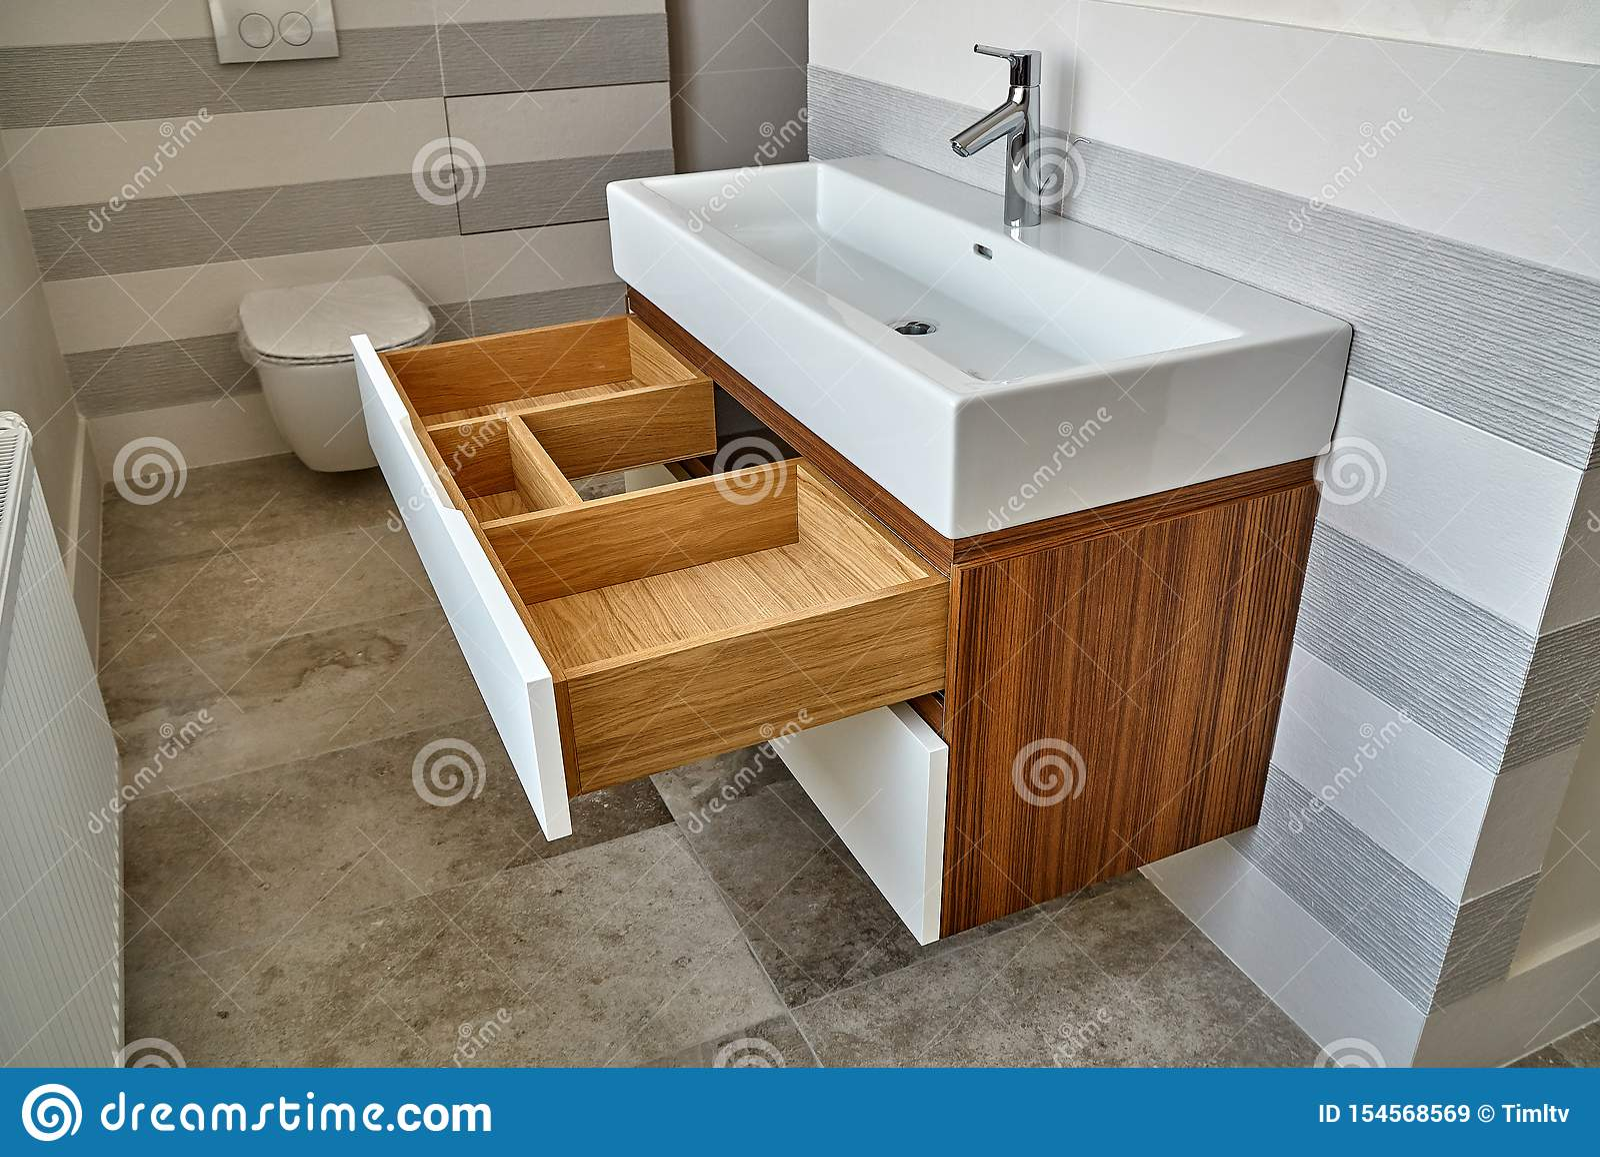 Wall Mounted Bathroom Vanity In Luxury Bathroom Stylish Interior Of Modern Bathroom Details Furniture Stock Image Image Of Luxury Veneer 154568569